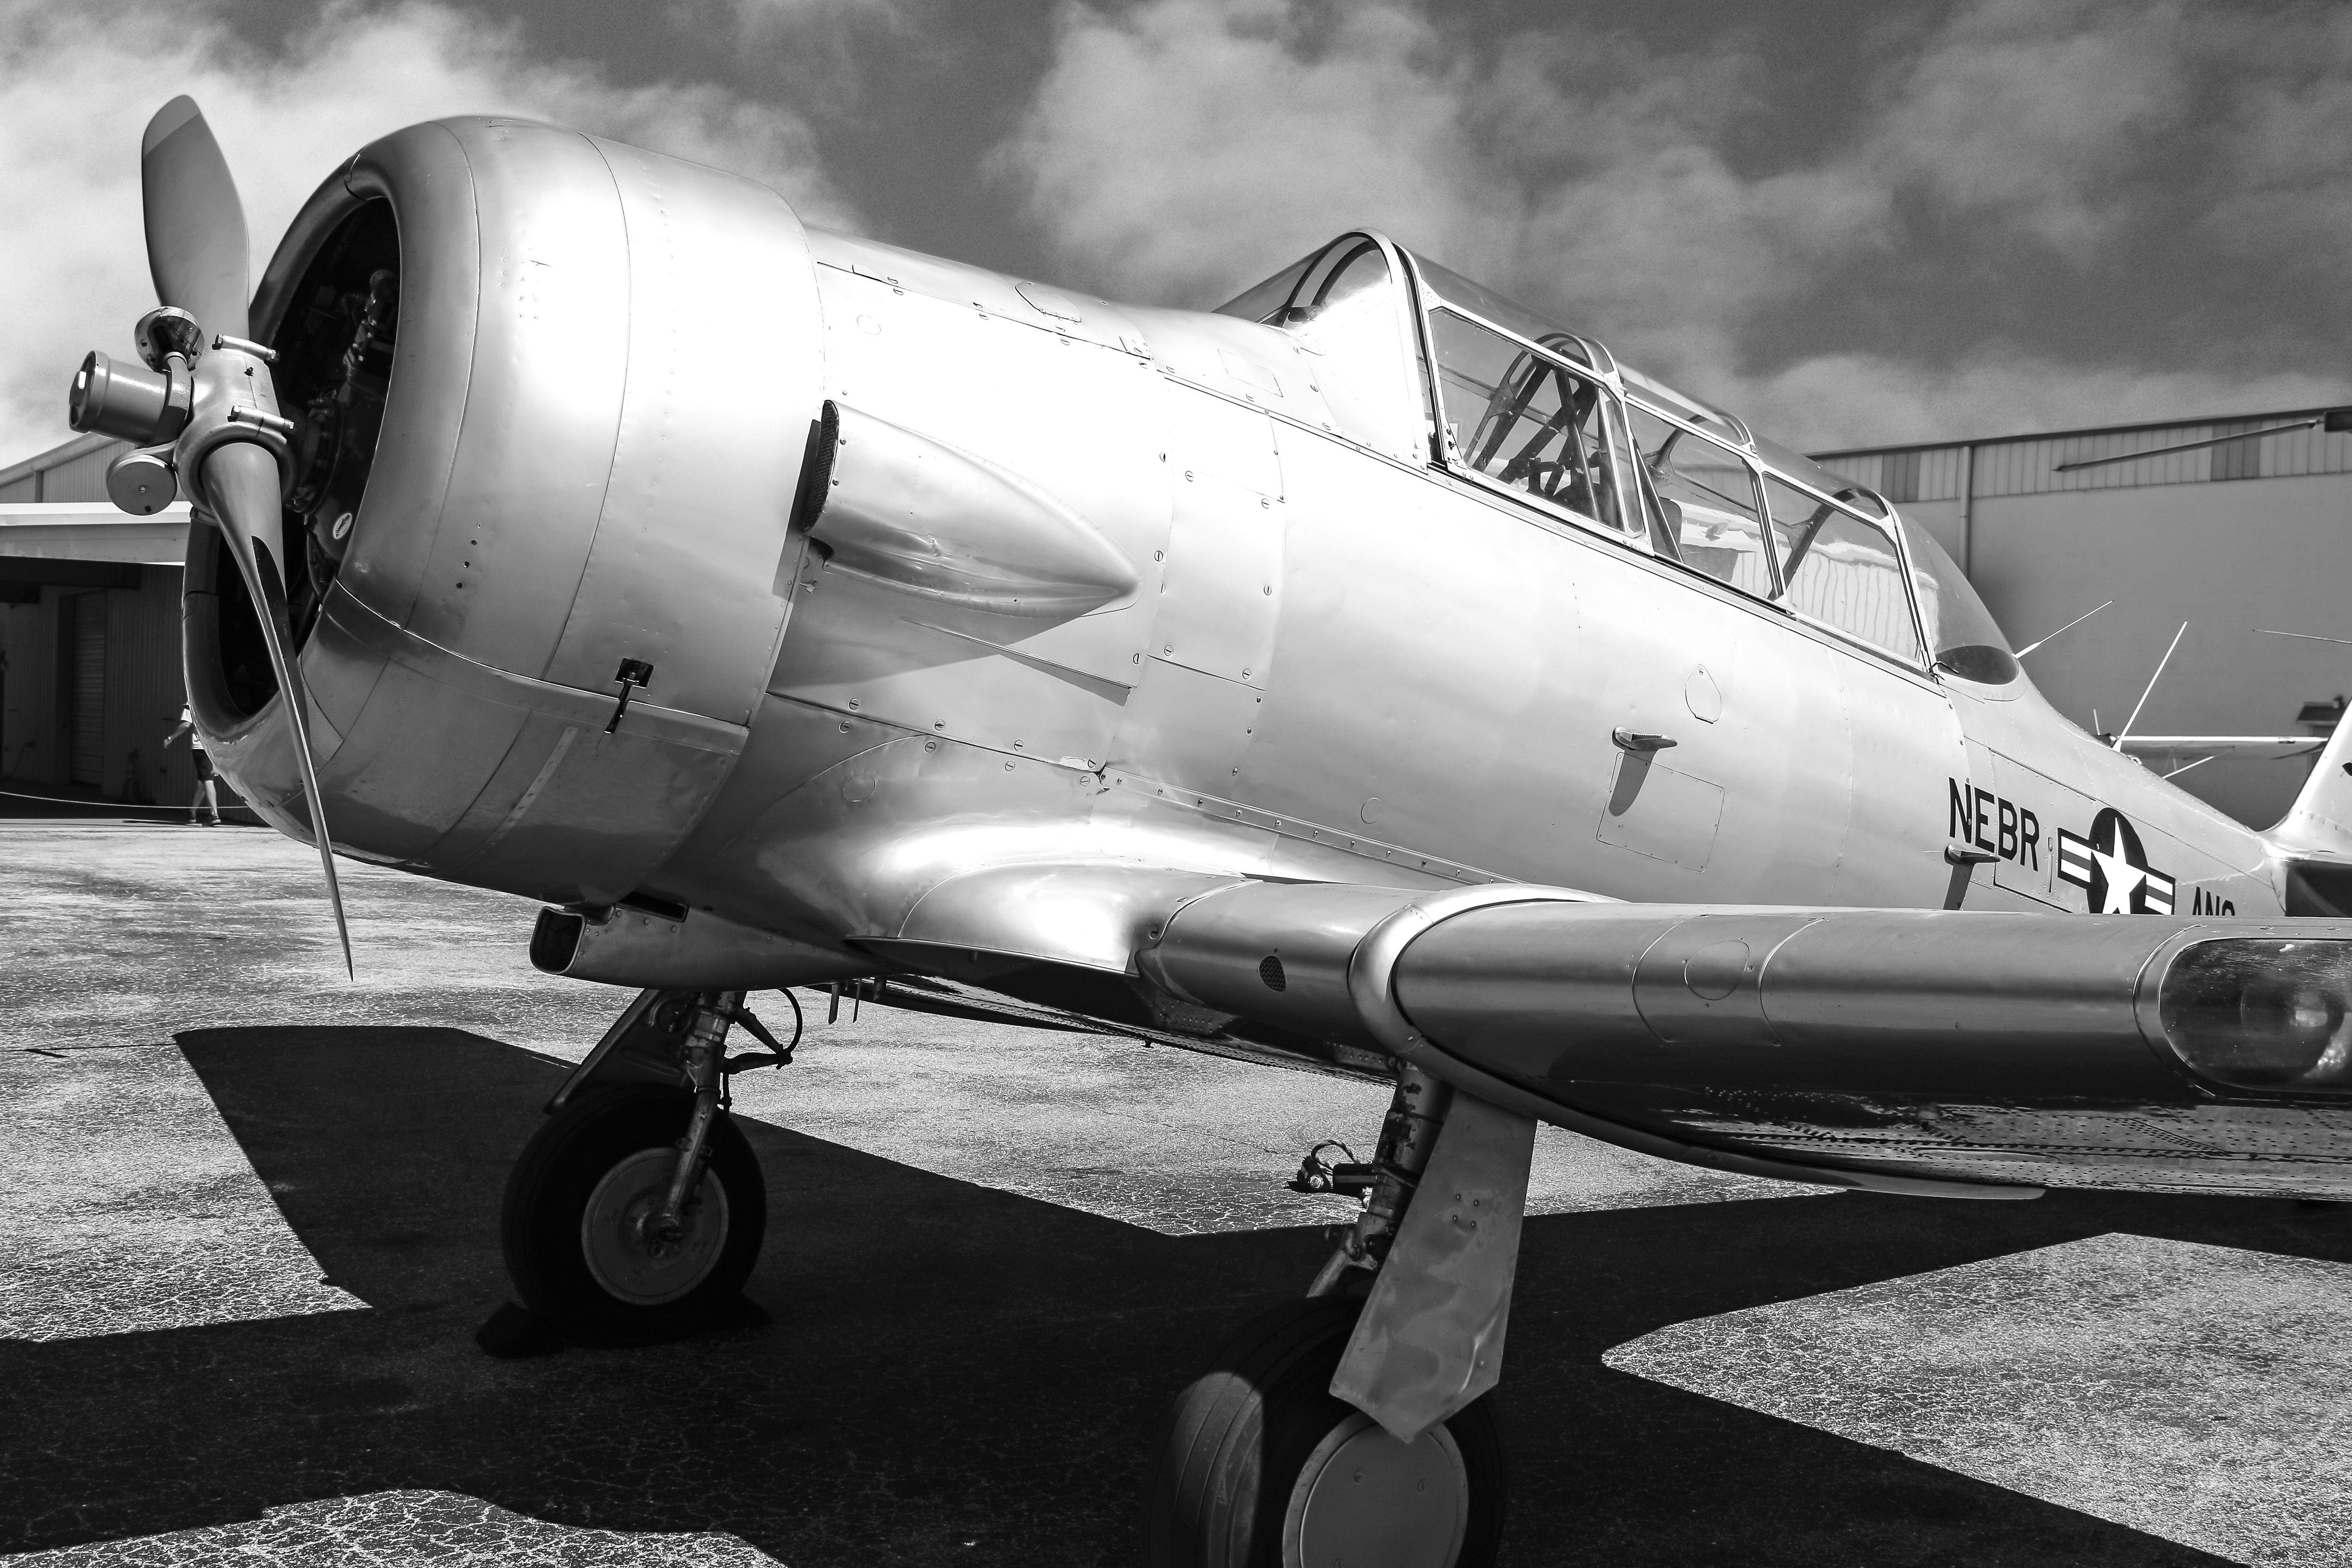 at6 texan vintage aviation wall decor print 12x18in satin photo